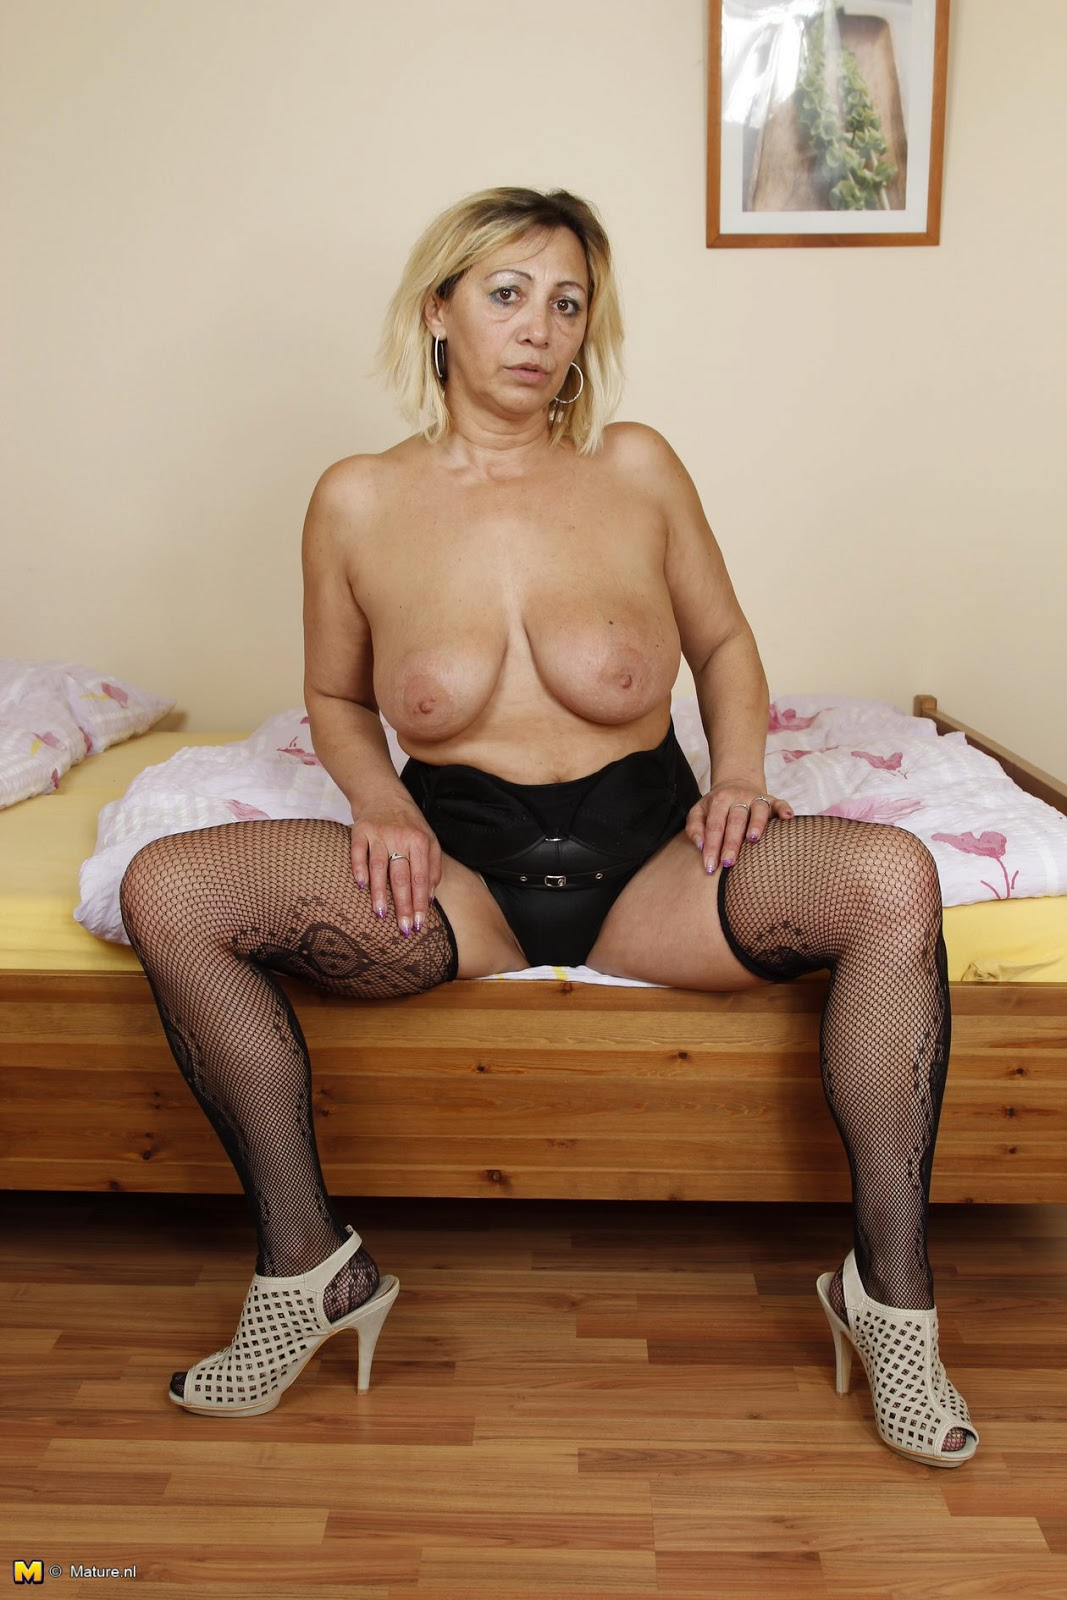 Miluse Havelova: More Miluse I have found